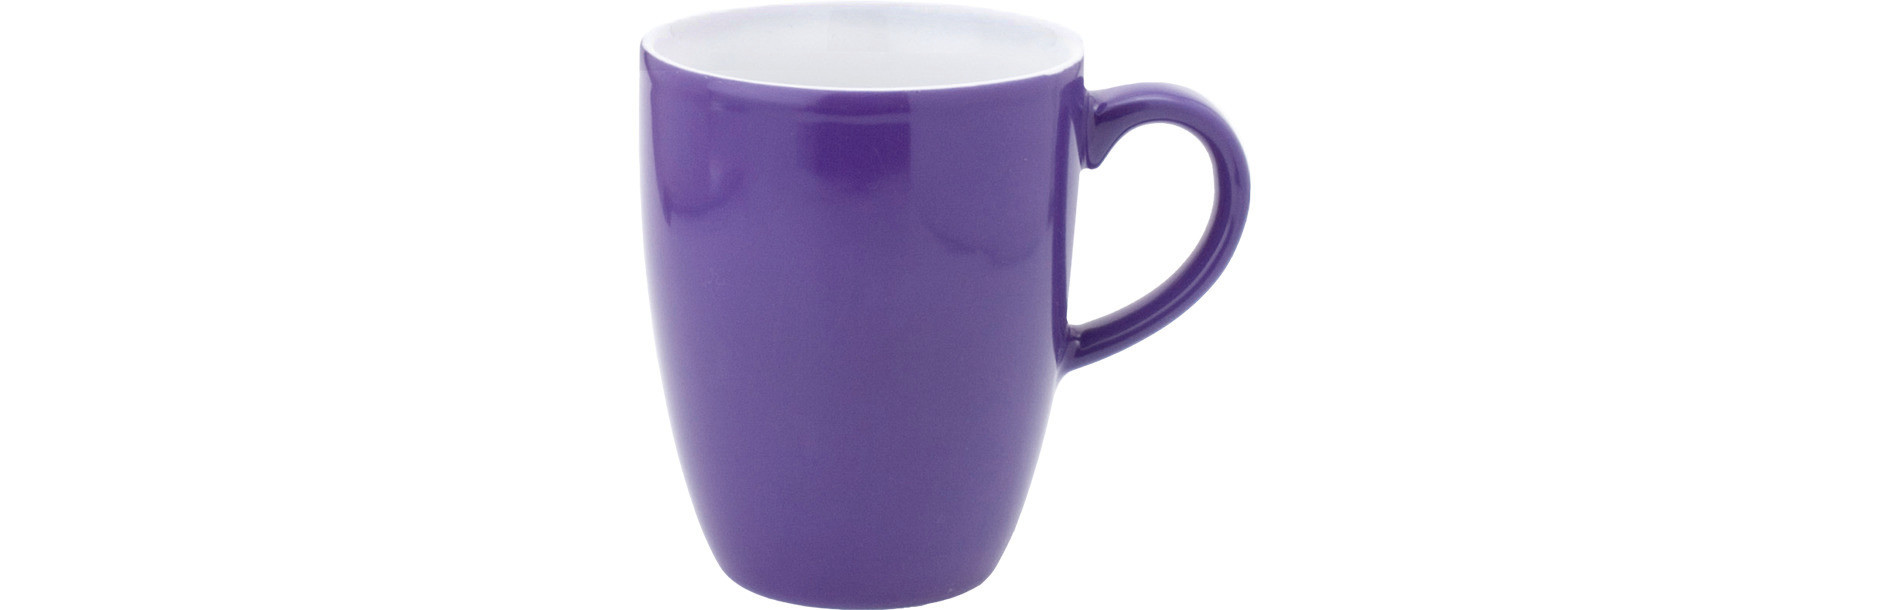 Pronto, Macchiatobecher stapelbar ø 80 mm / 0,28 l lila